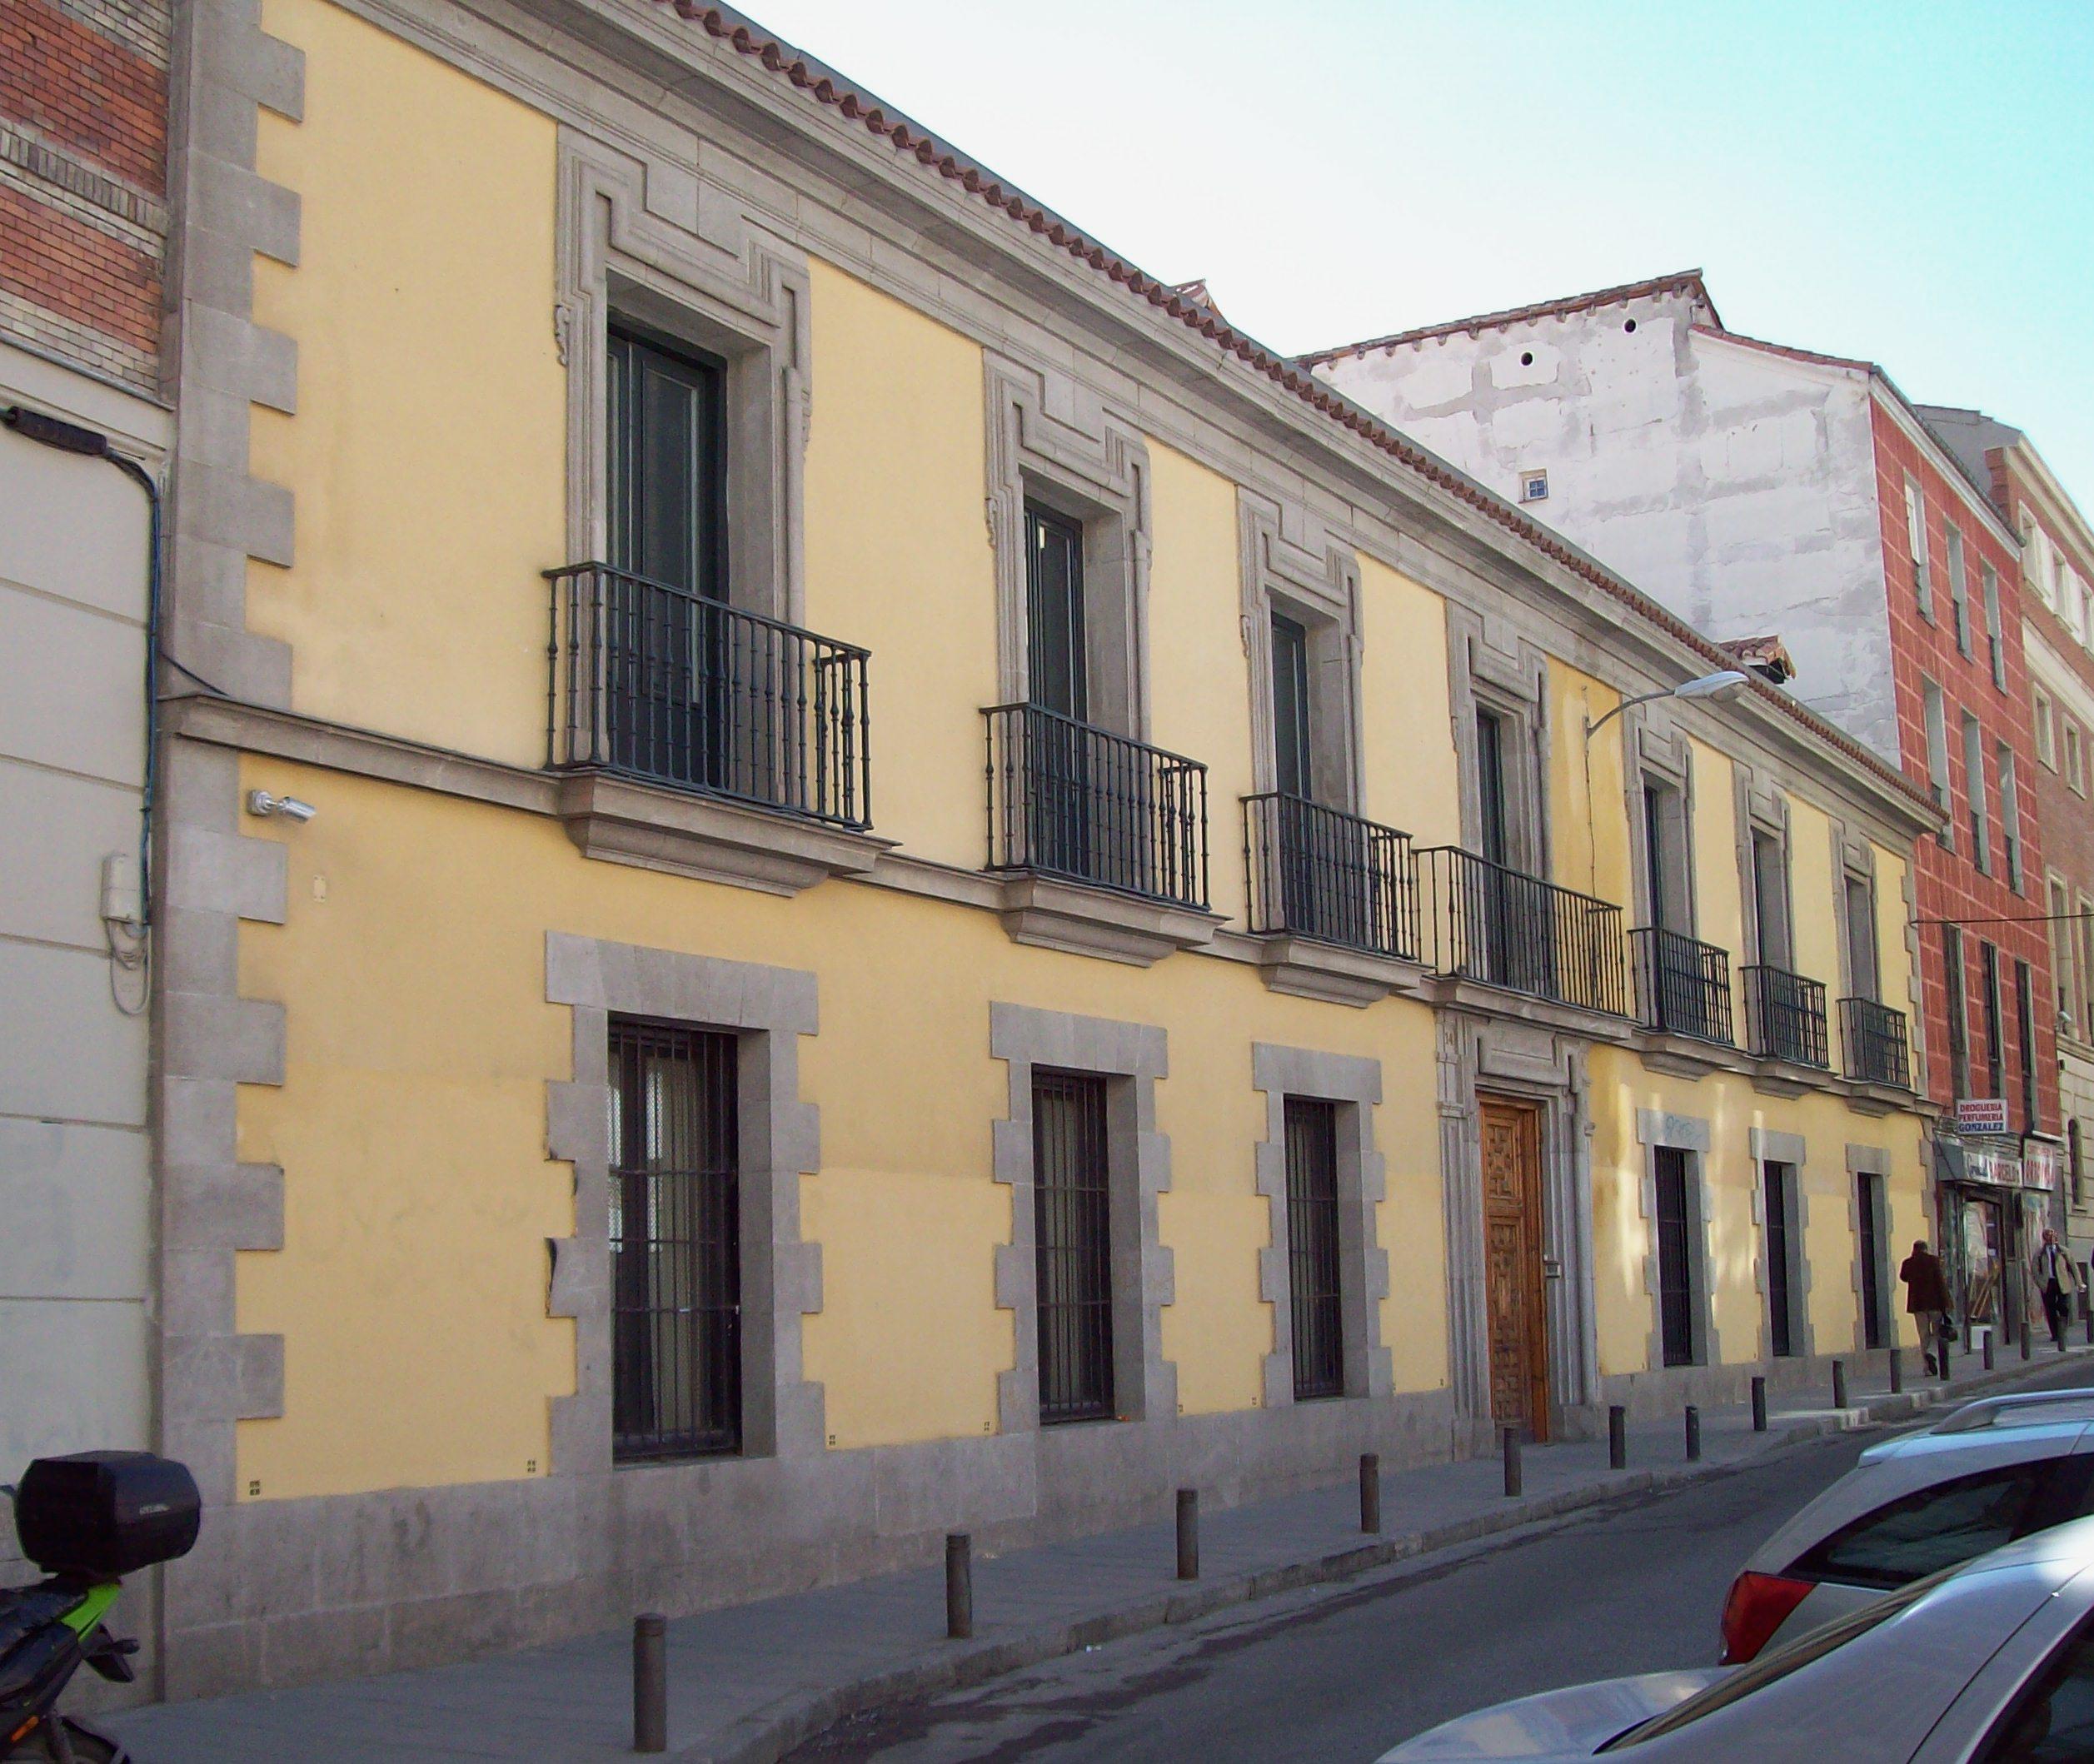 Museo Romantico.File Museo Romantico Madrid 01 Jpg Wikimedia Commons